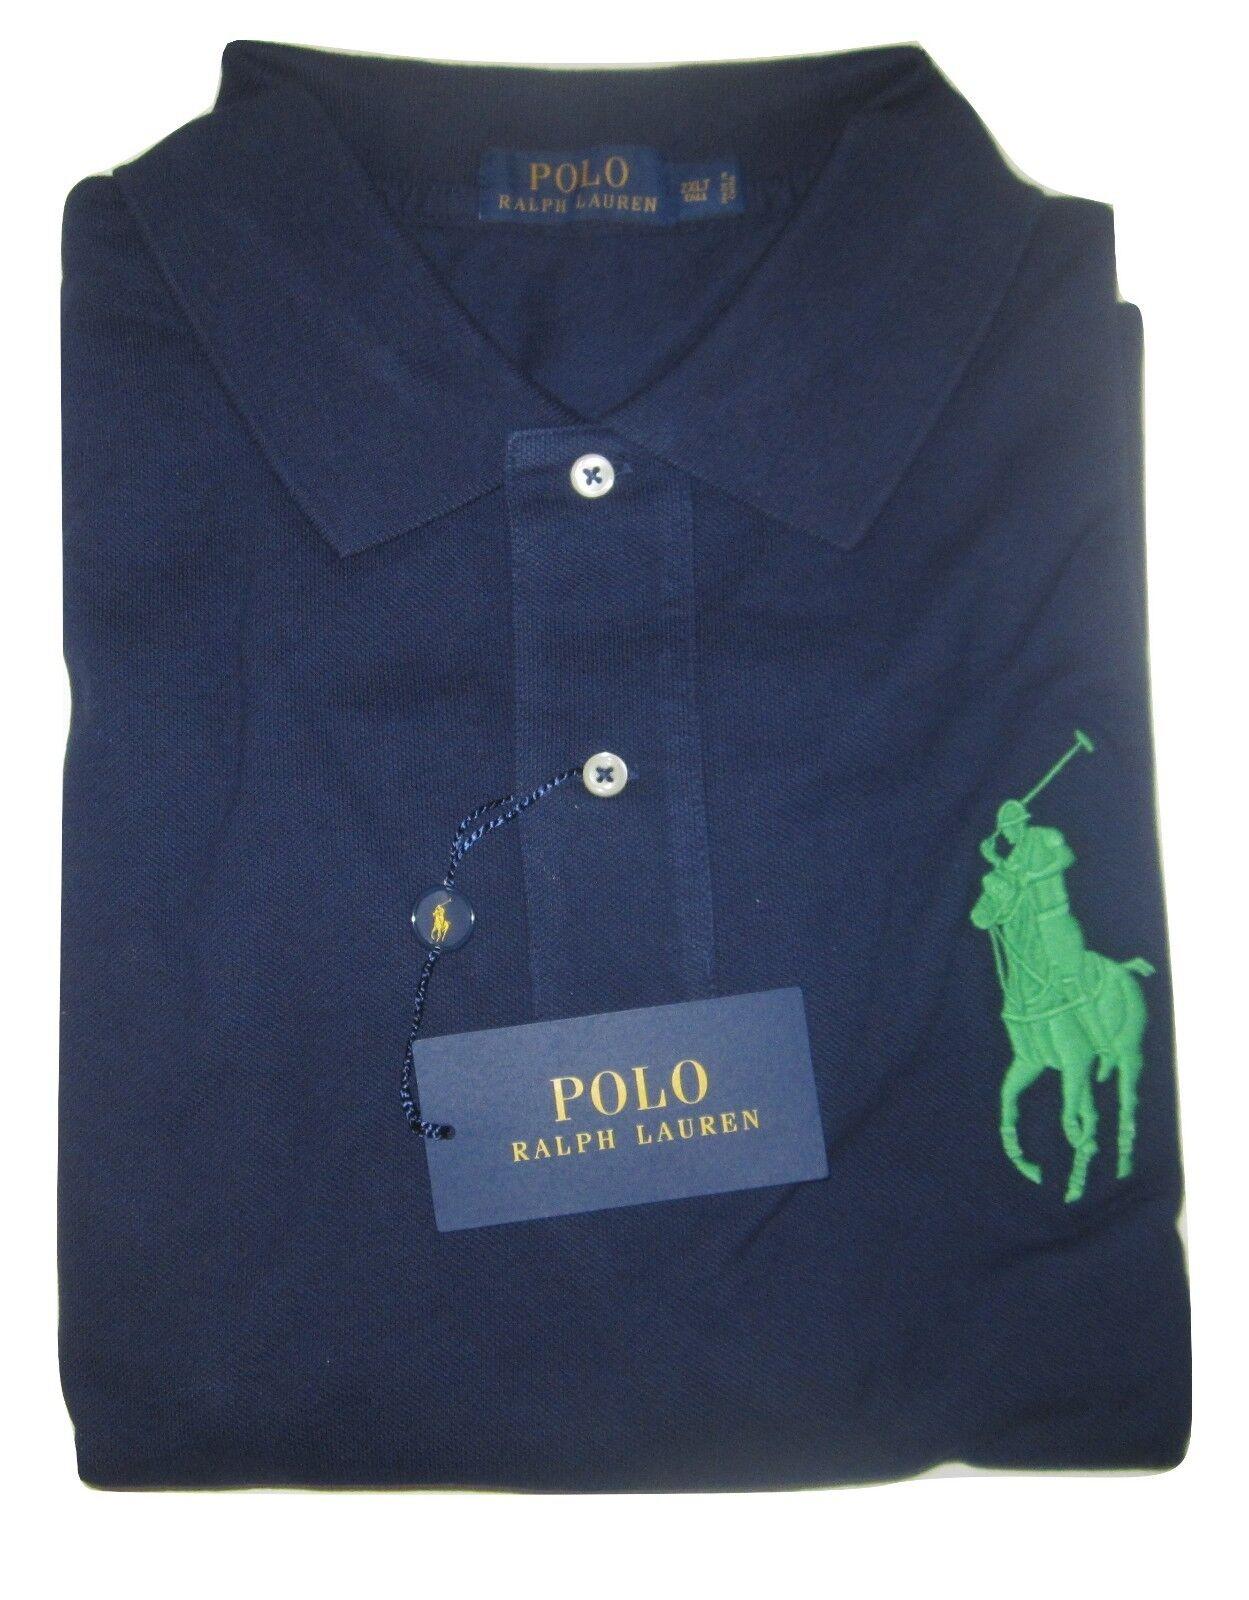 RALPH LAUREN Polo Mens Big & Tall Cotton Polo Shirt Long Sleeve LT XLT NWT